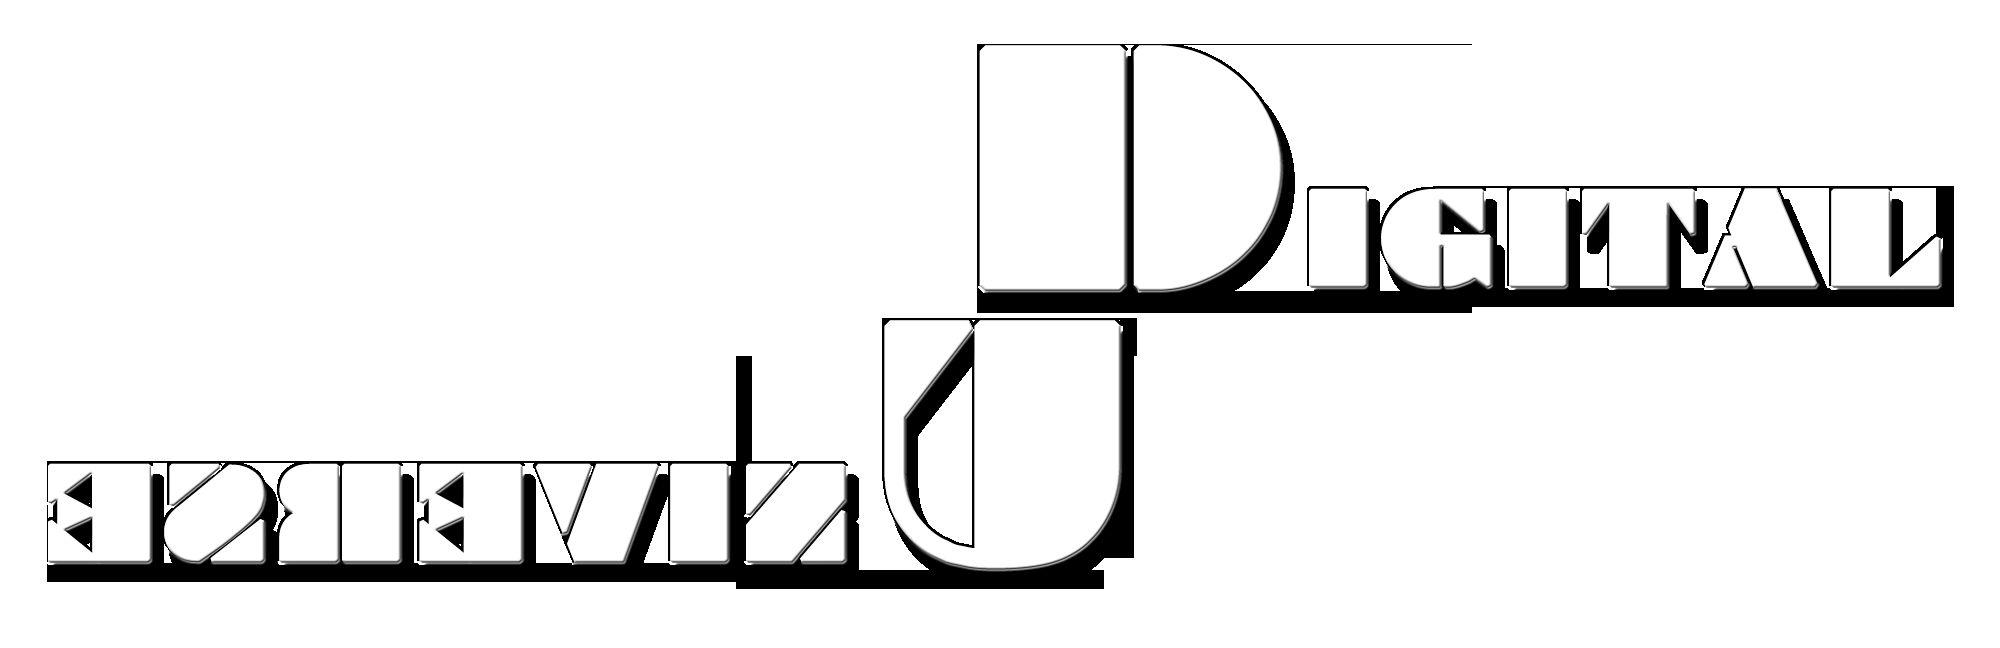 логотип для компании-разработчика ММО-игр - дизайнер m0nch